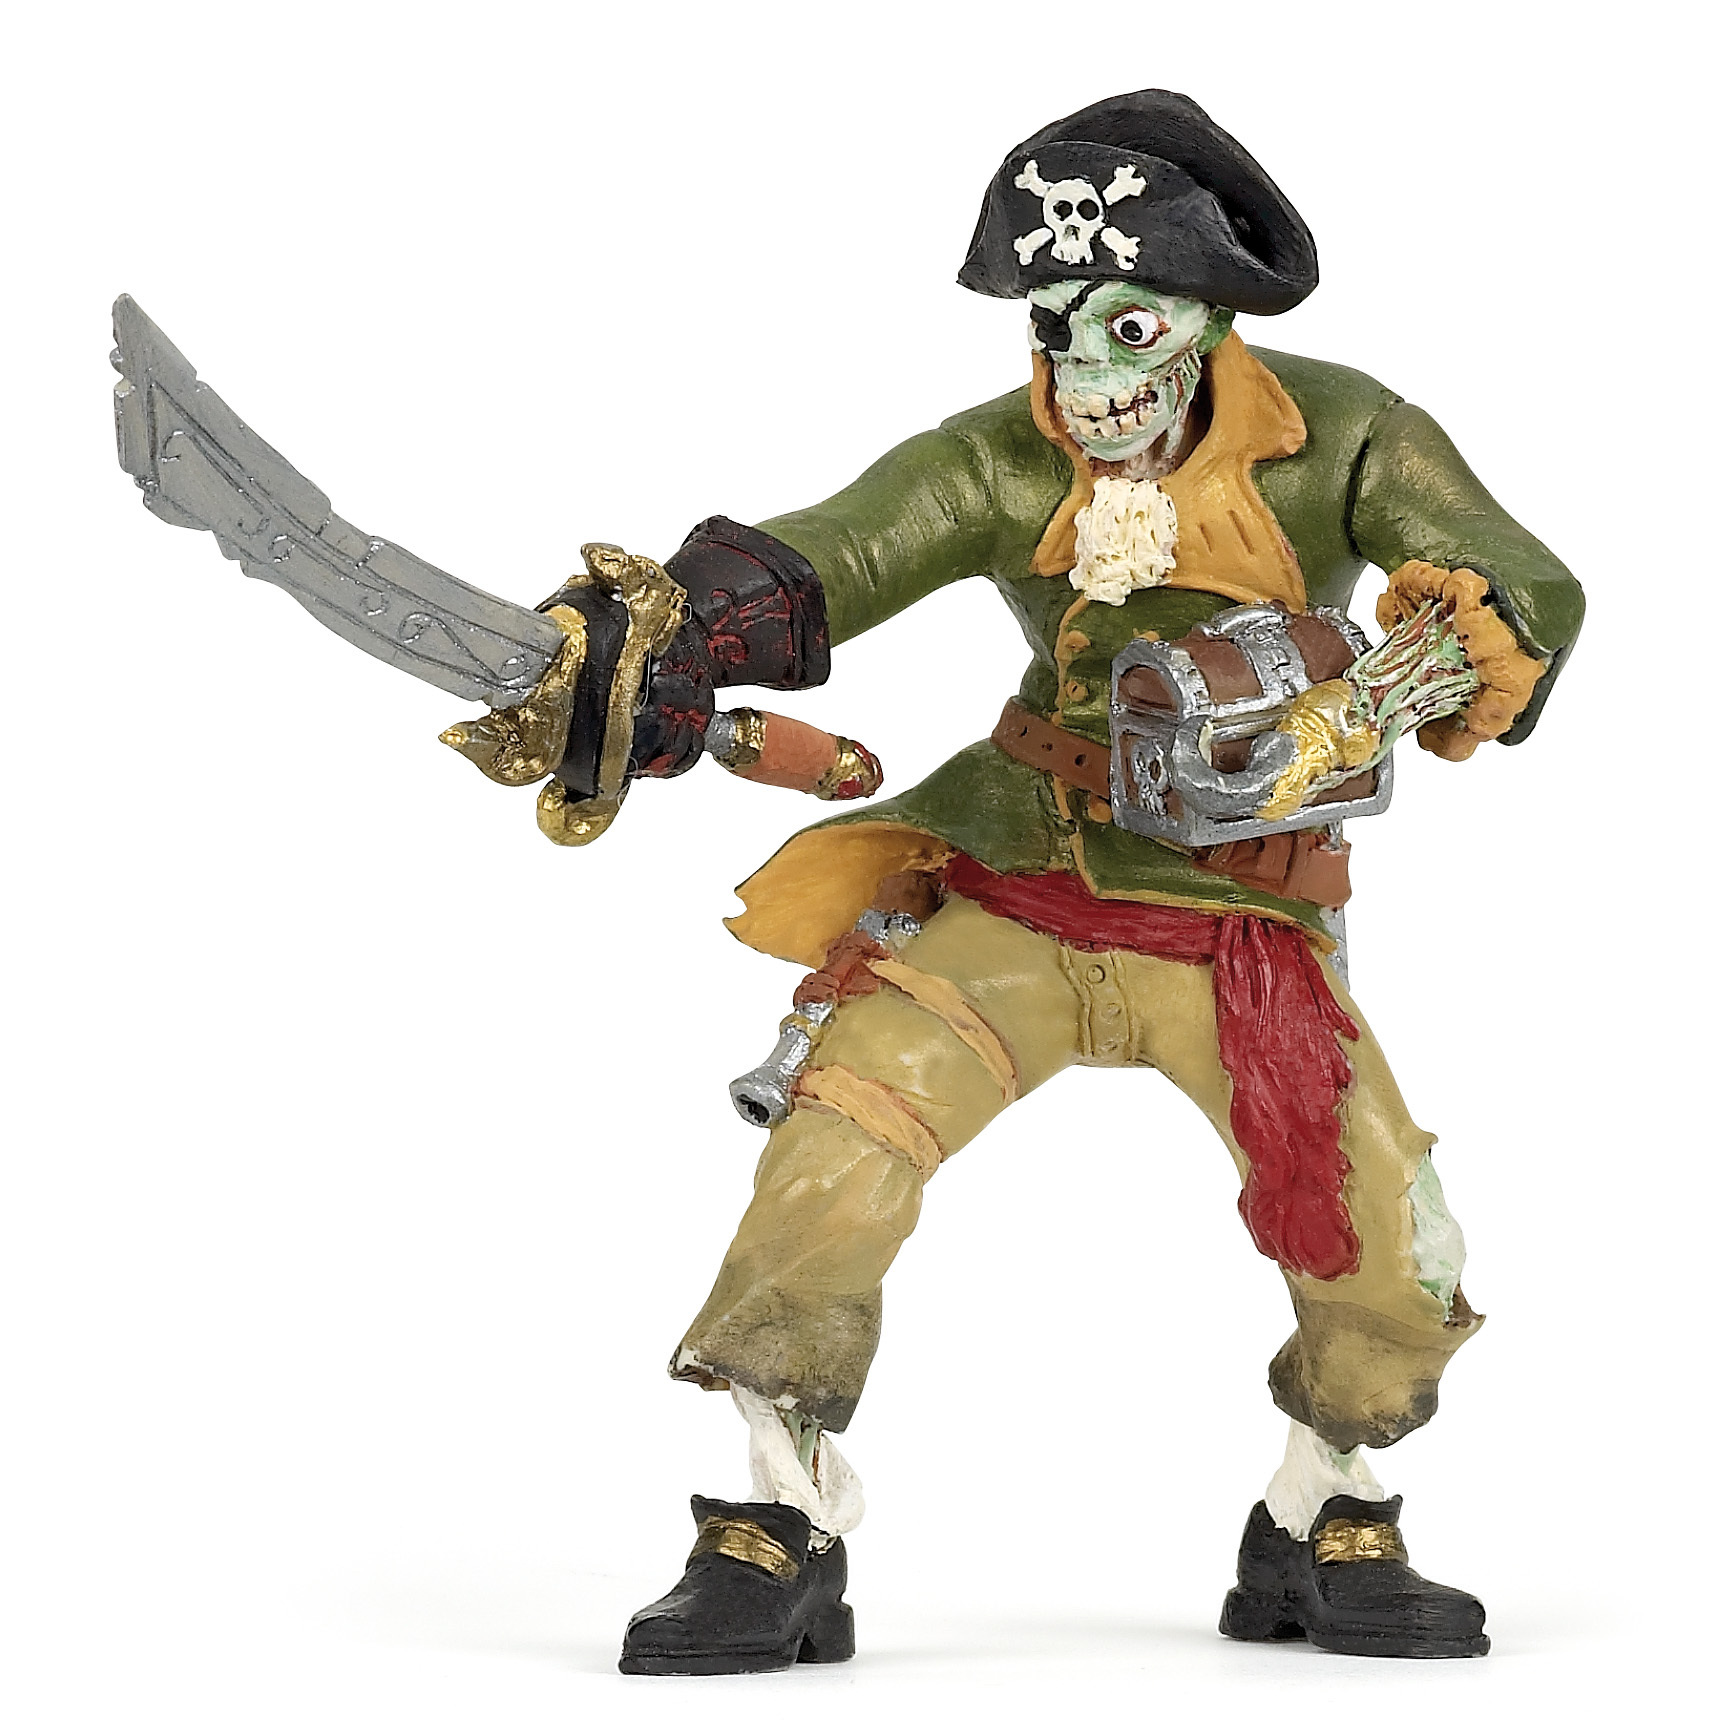 Pirate zombie - PAPO - 39455